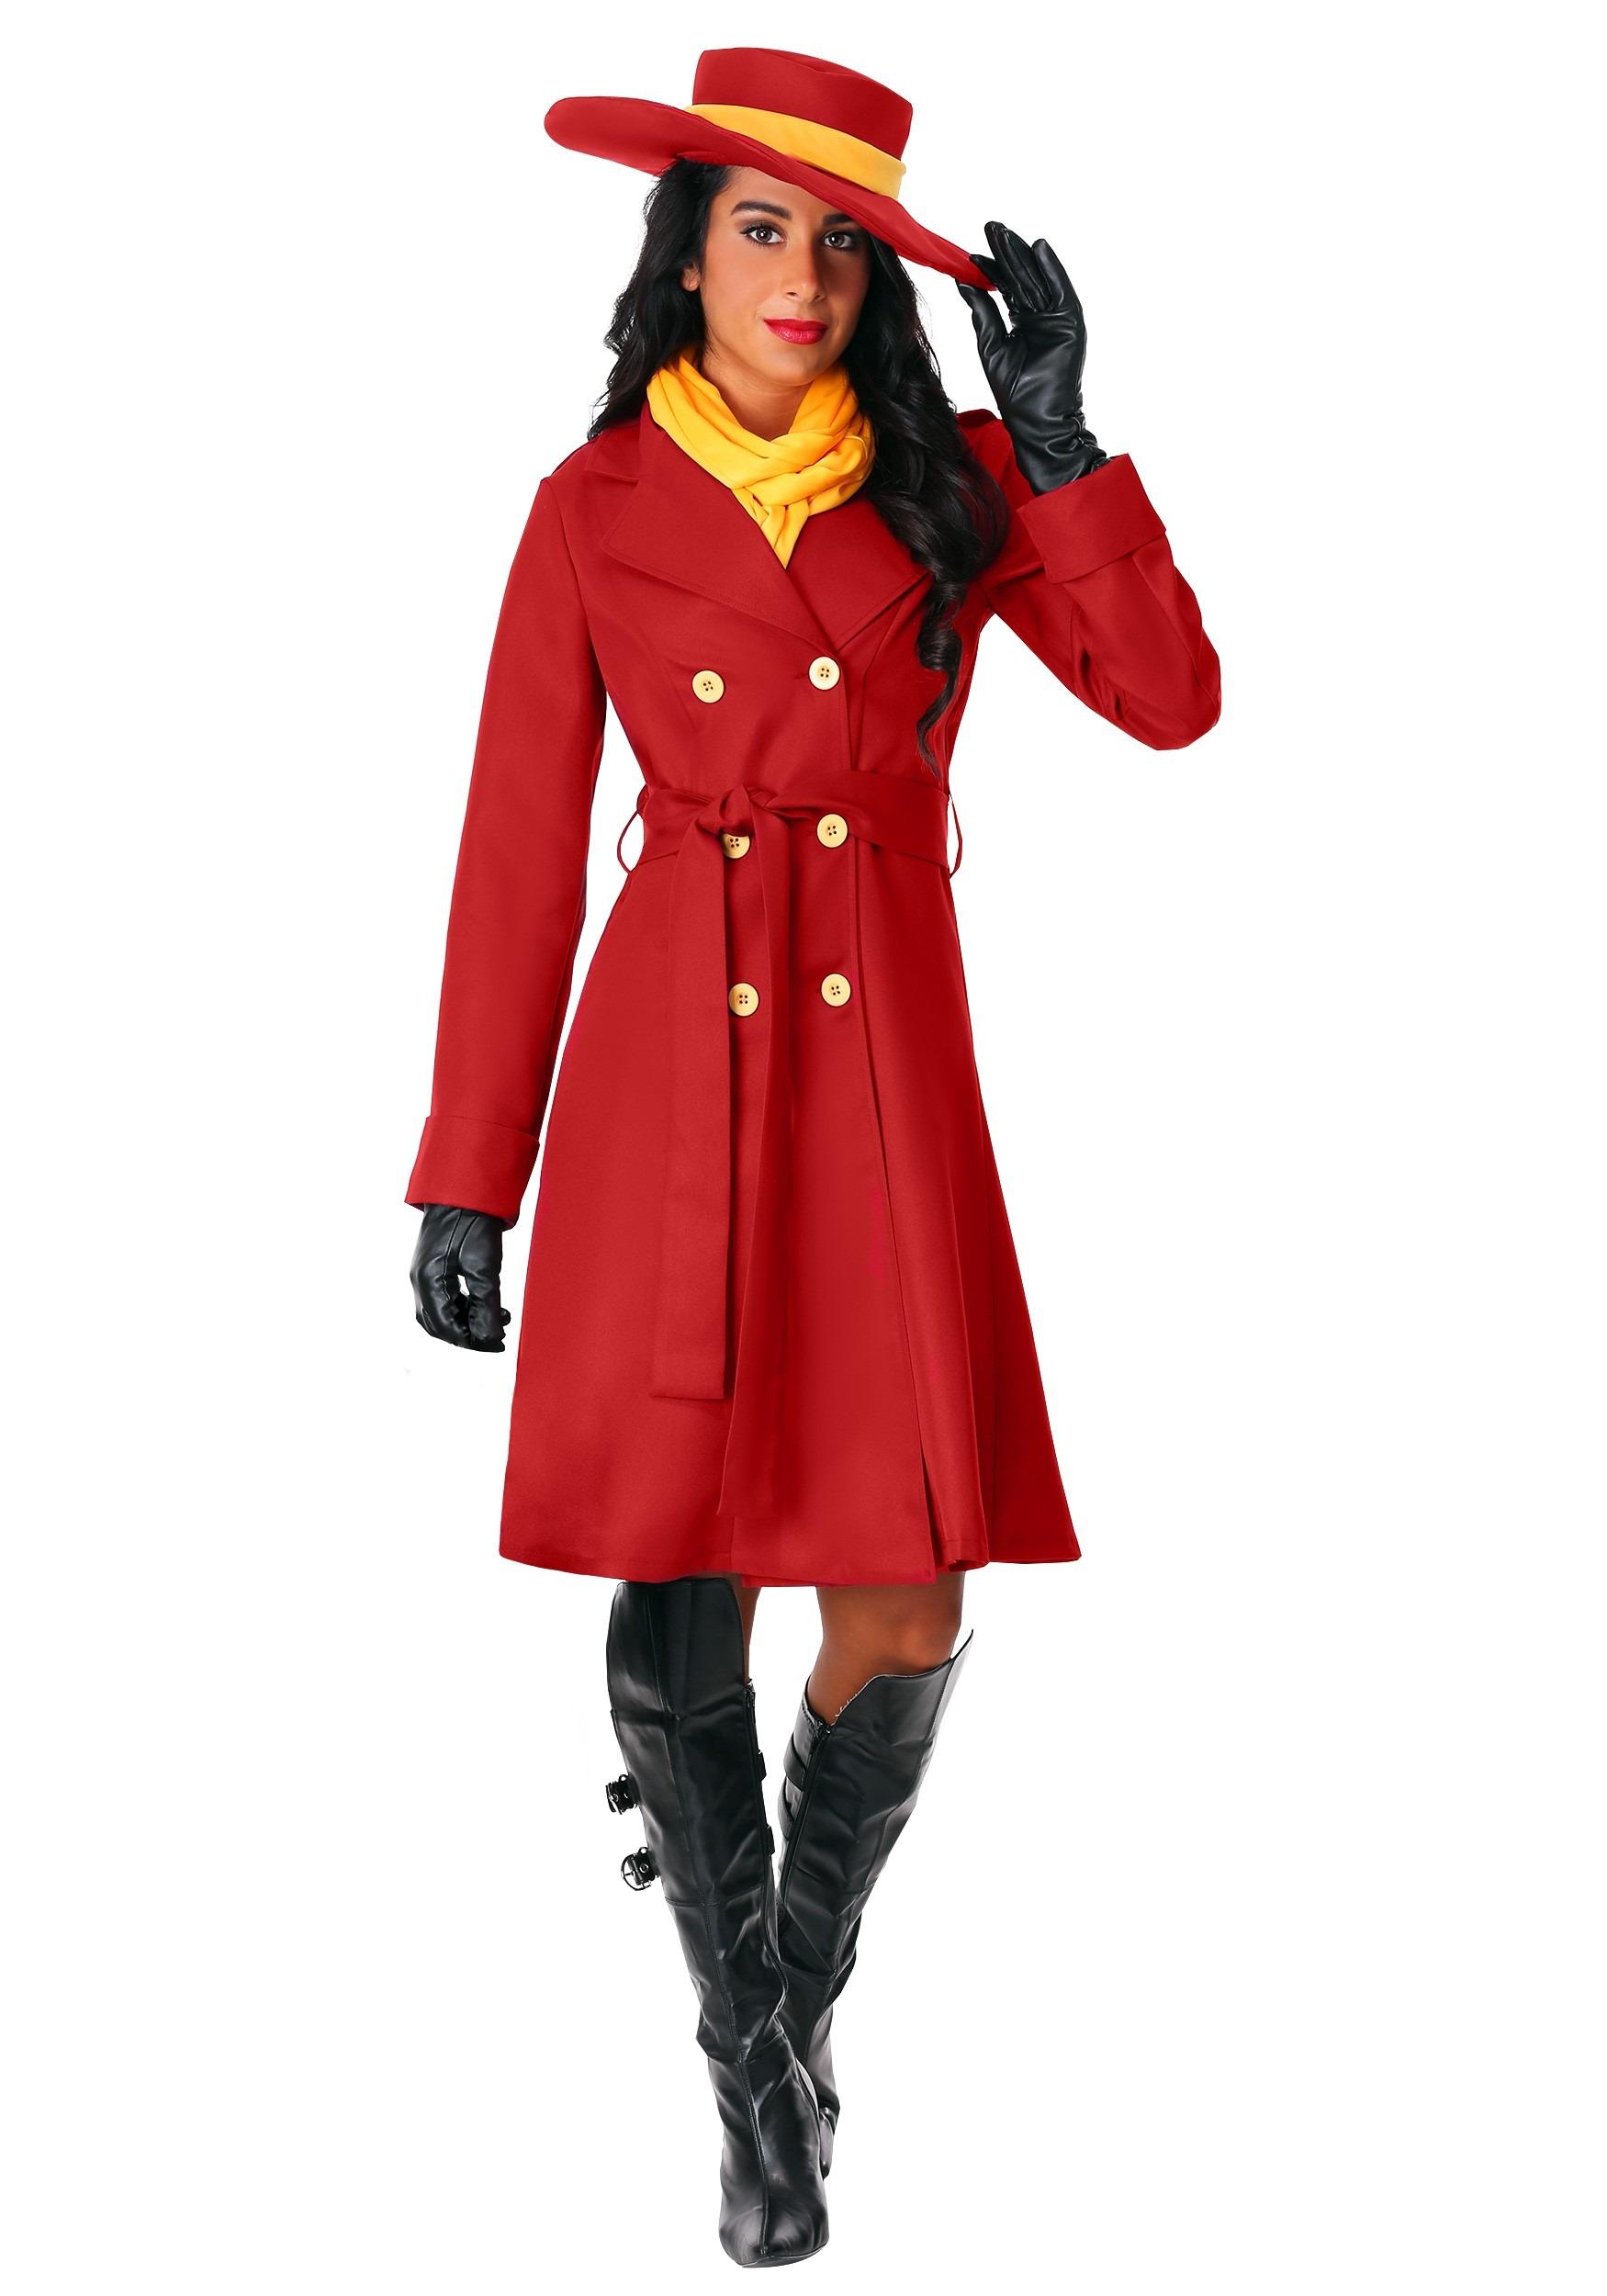 Plus Size Carmen Sandiego Costume for Women | Exclusive